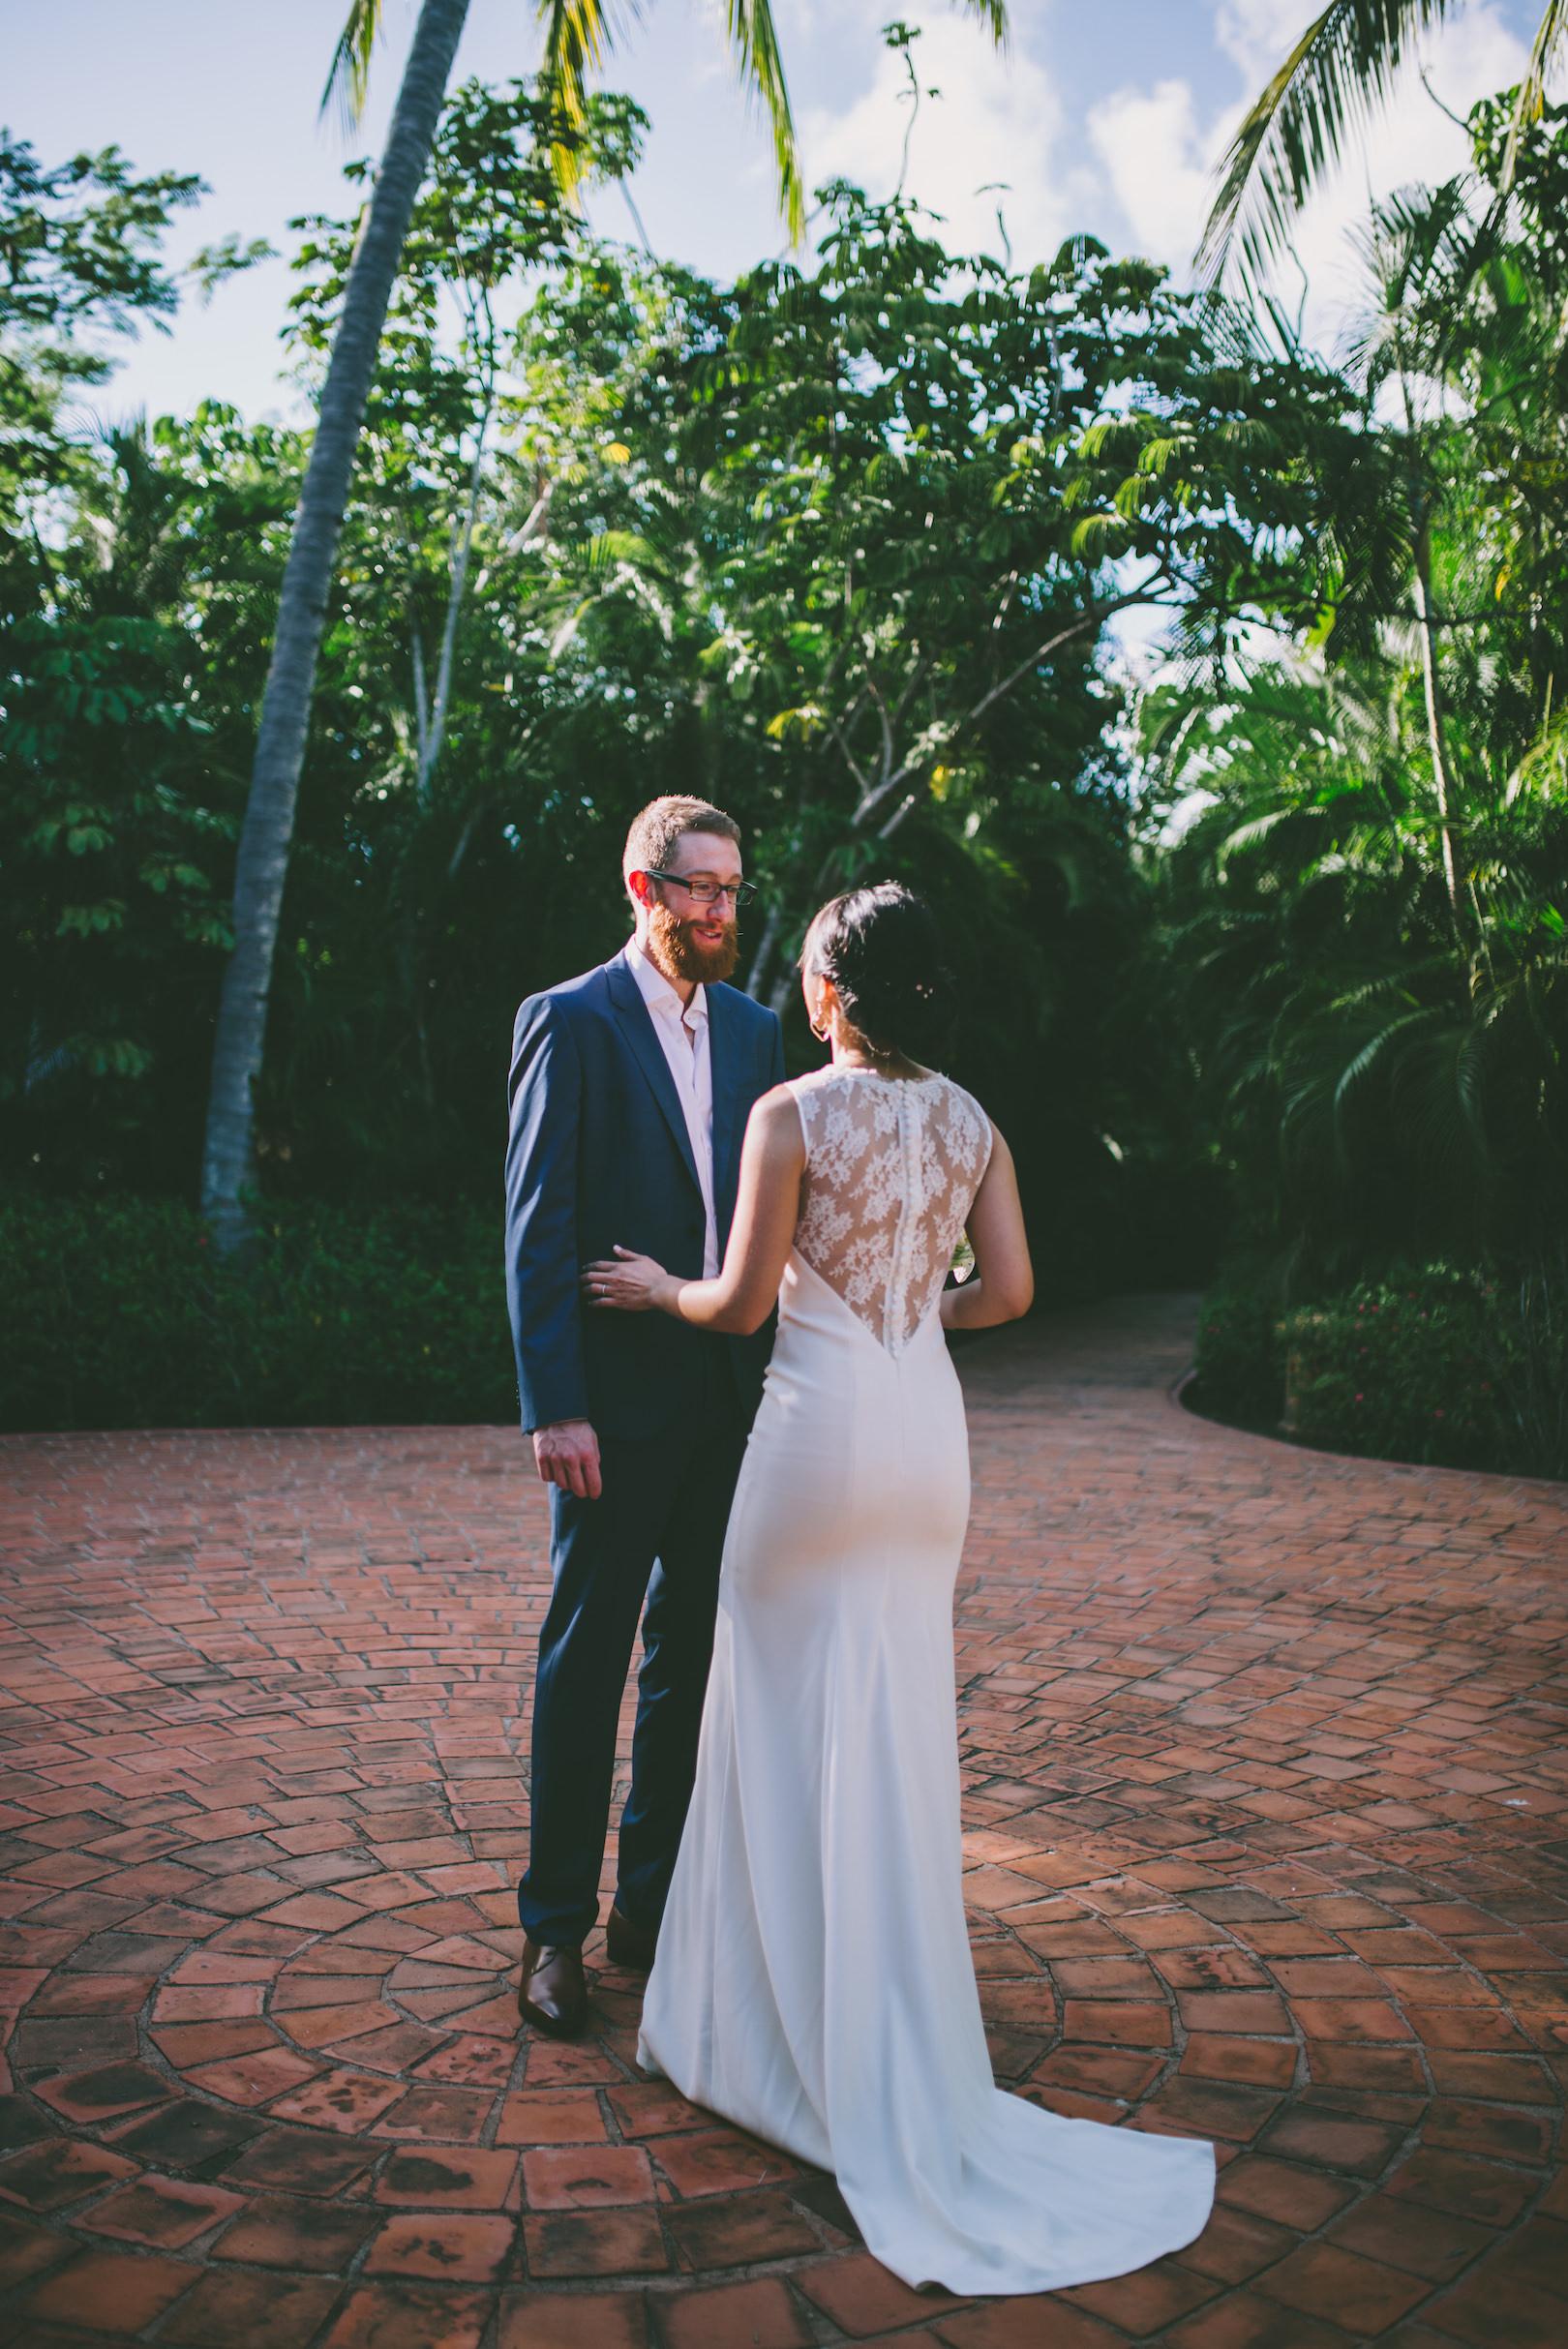 Nathan & Felicia - Wedding Day - © Dallas Kolotylo Photography - 267